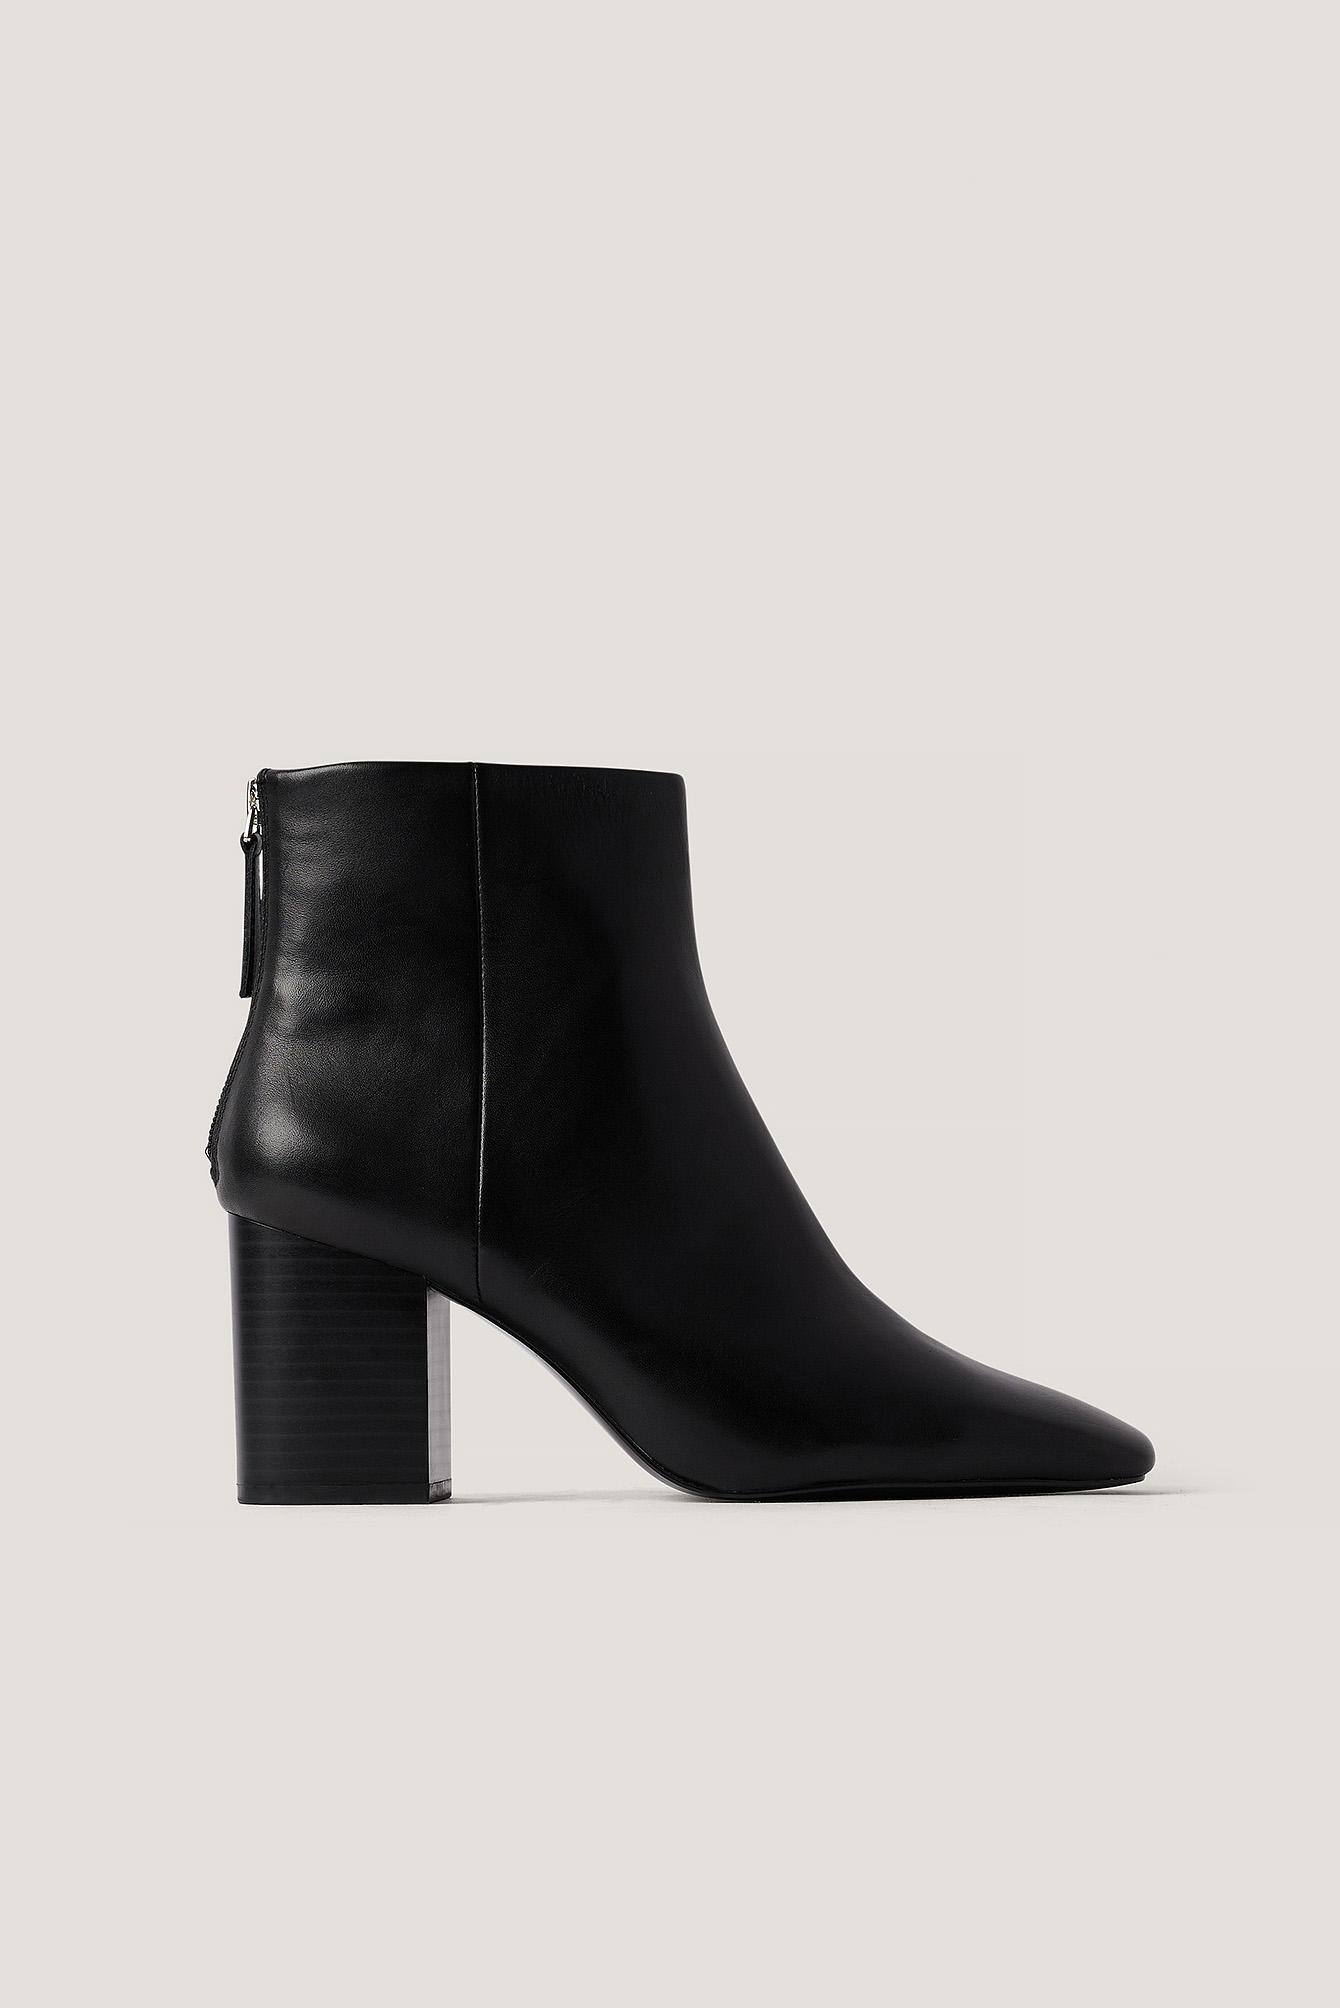 Mango Alba Ankle Boots - Black